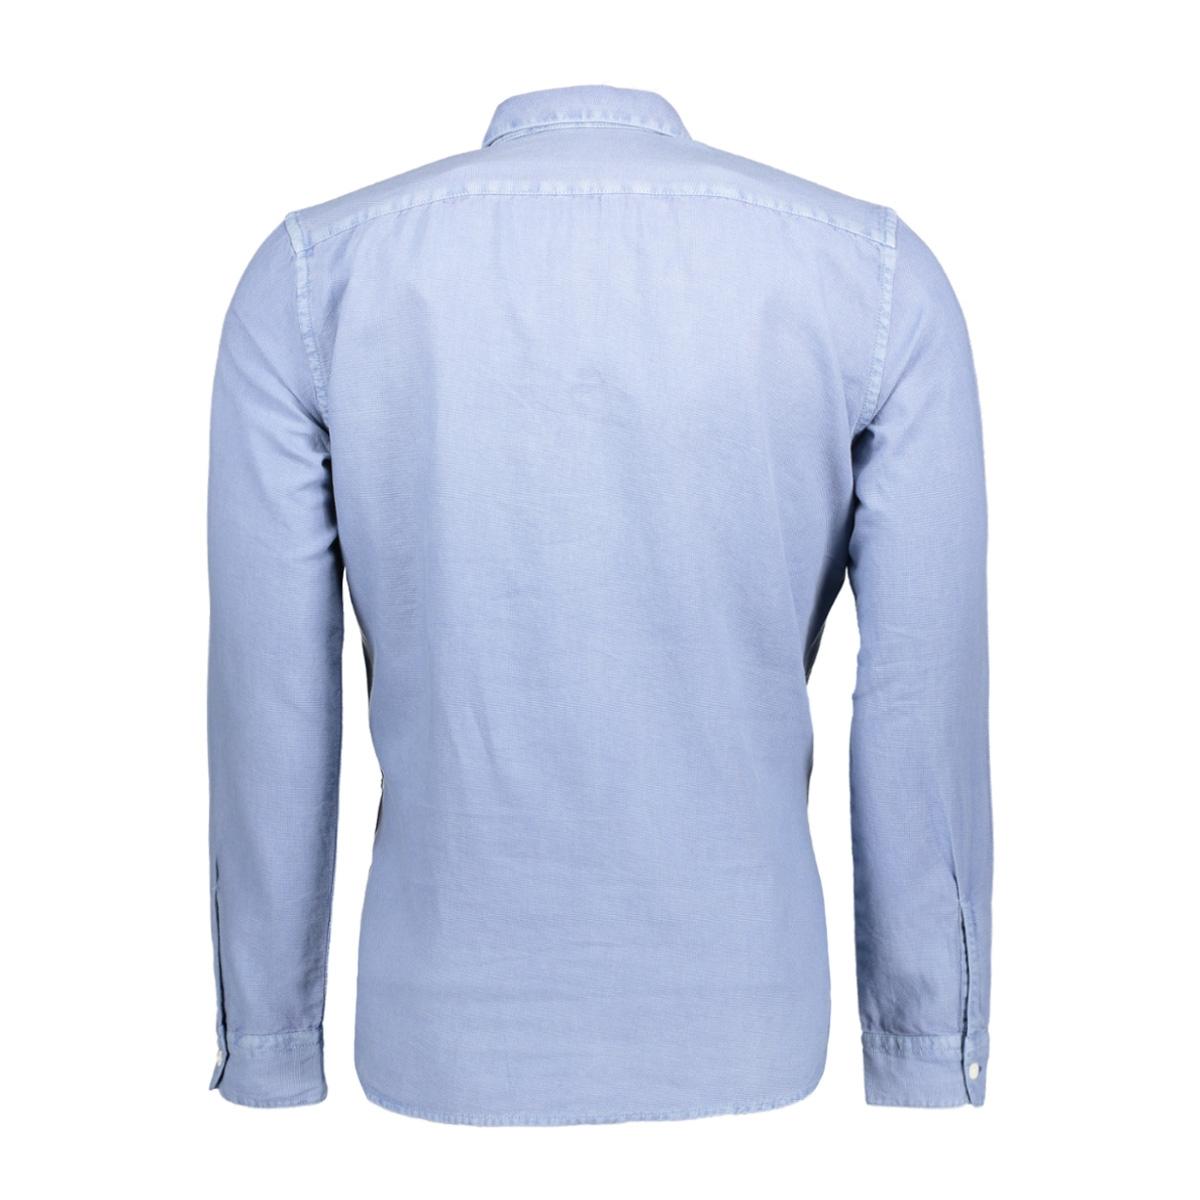 2055071.00.12 tom tailor overhemd 6677